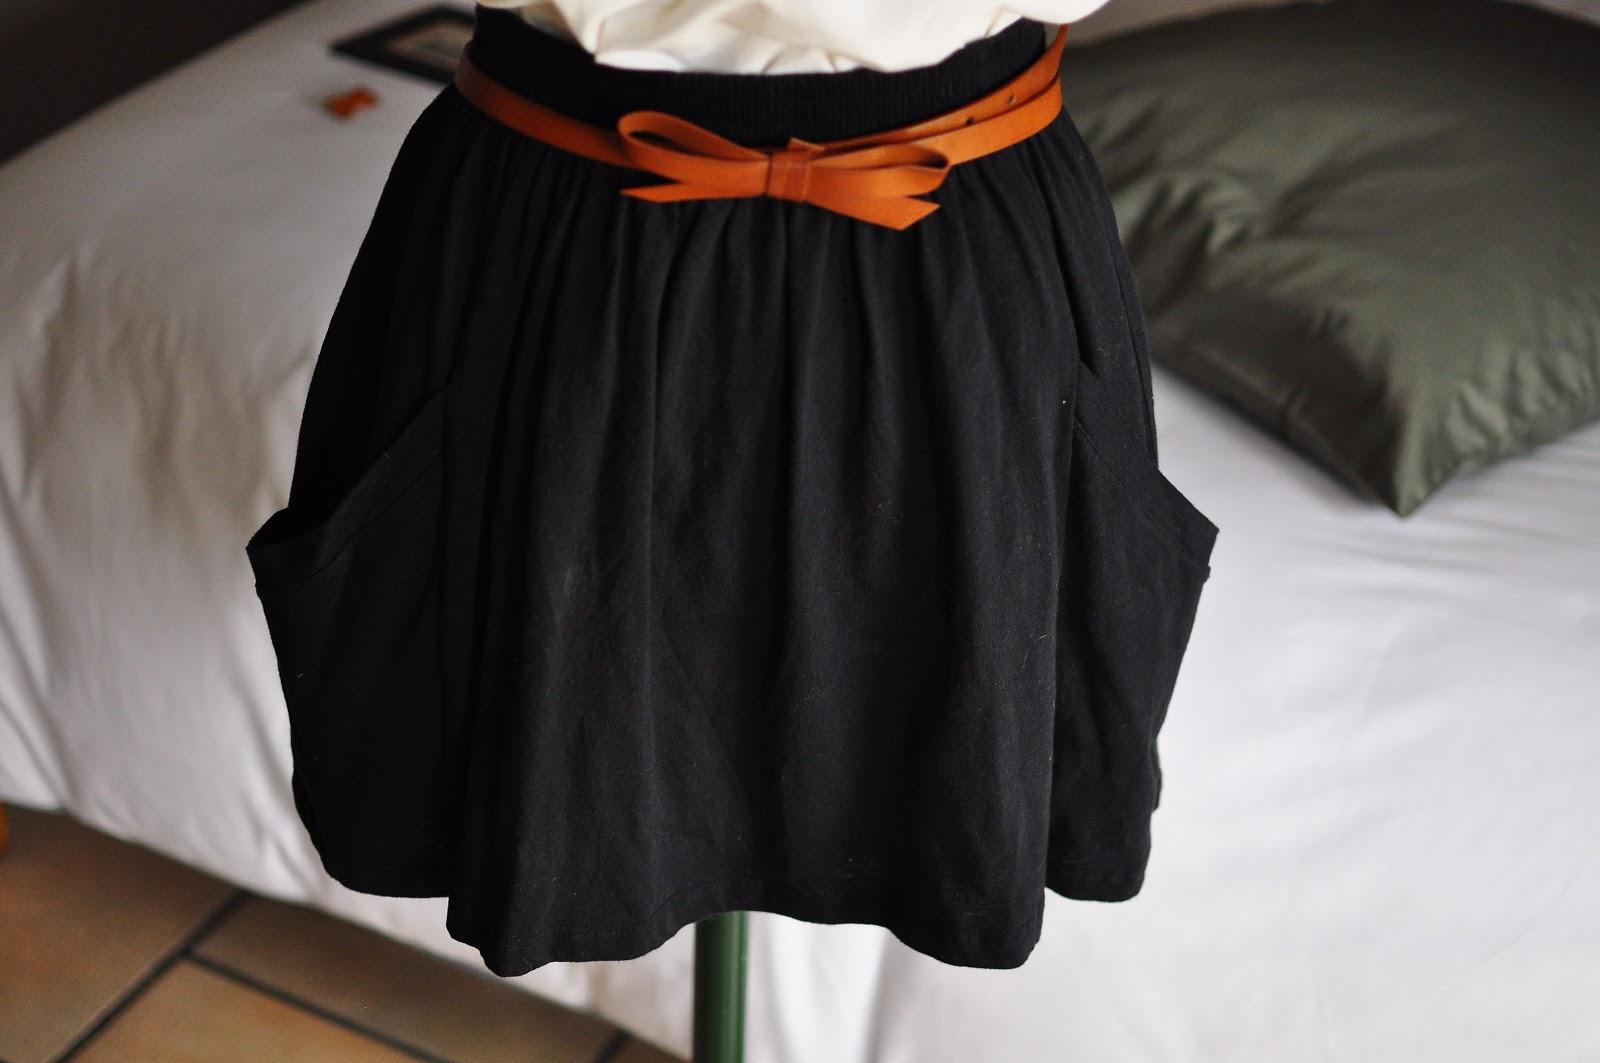 le dressing de lullaby jupe patineuse zara esprit american apparel. Black Bedroom Furniture Sets. Home Design Ideas